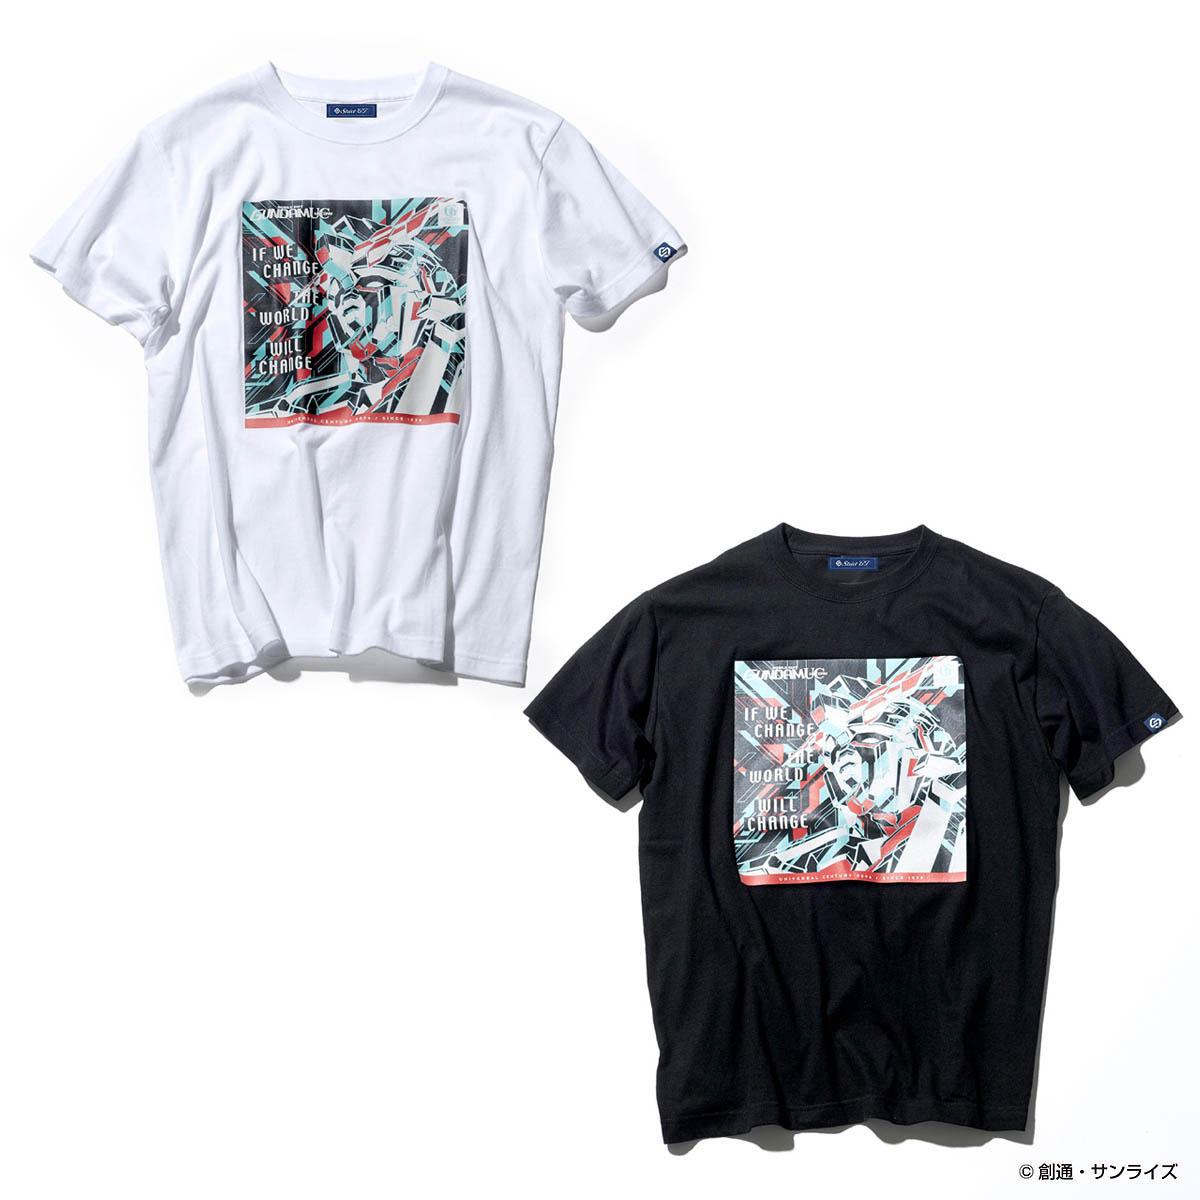 STRICT-G GUNDAM RECORDS 『機動戦士ガンダムUC』Tシャツ